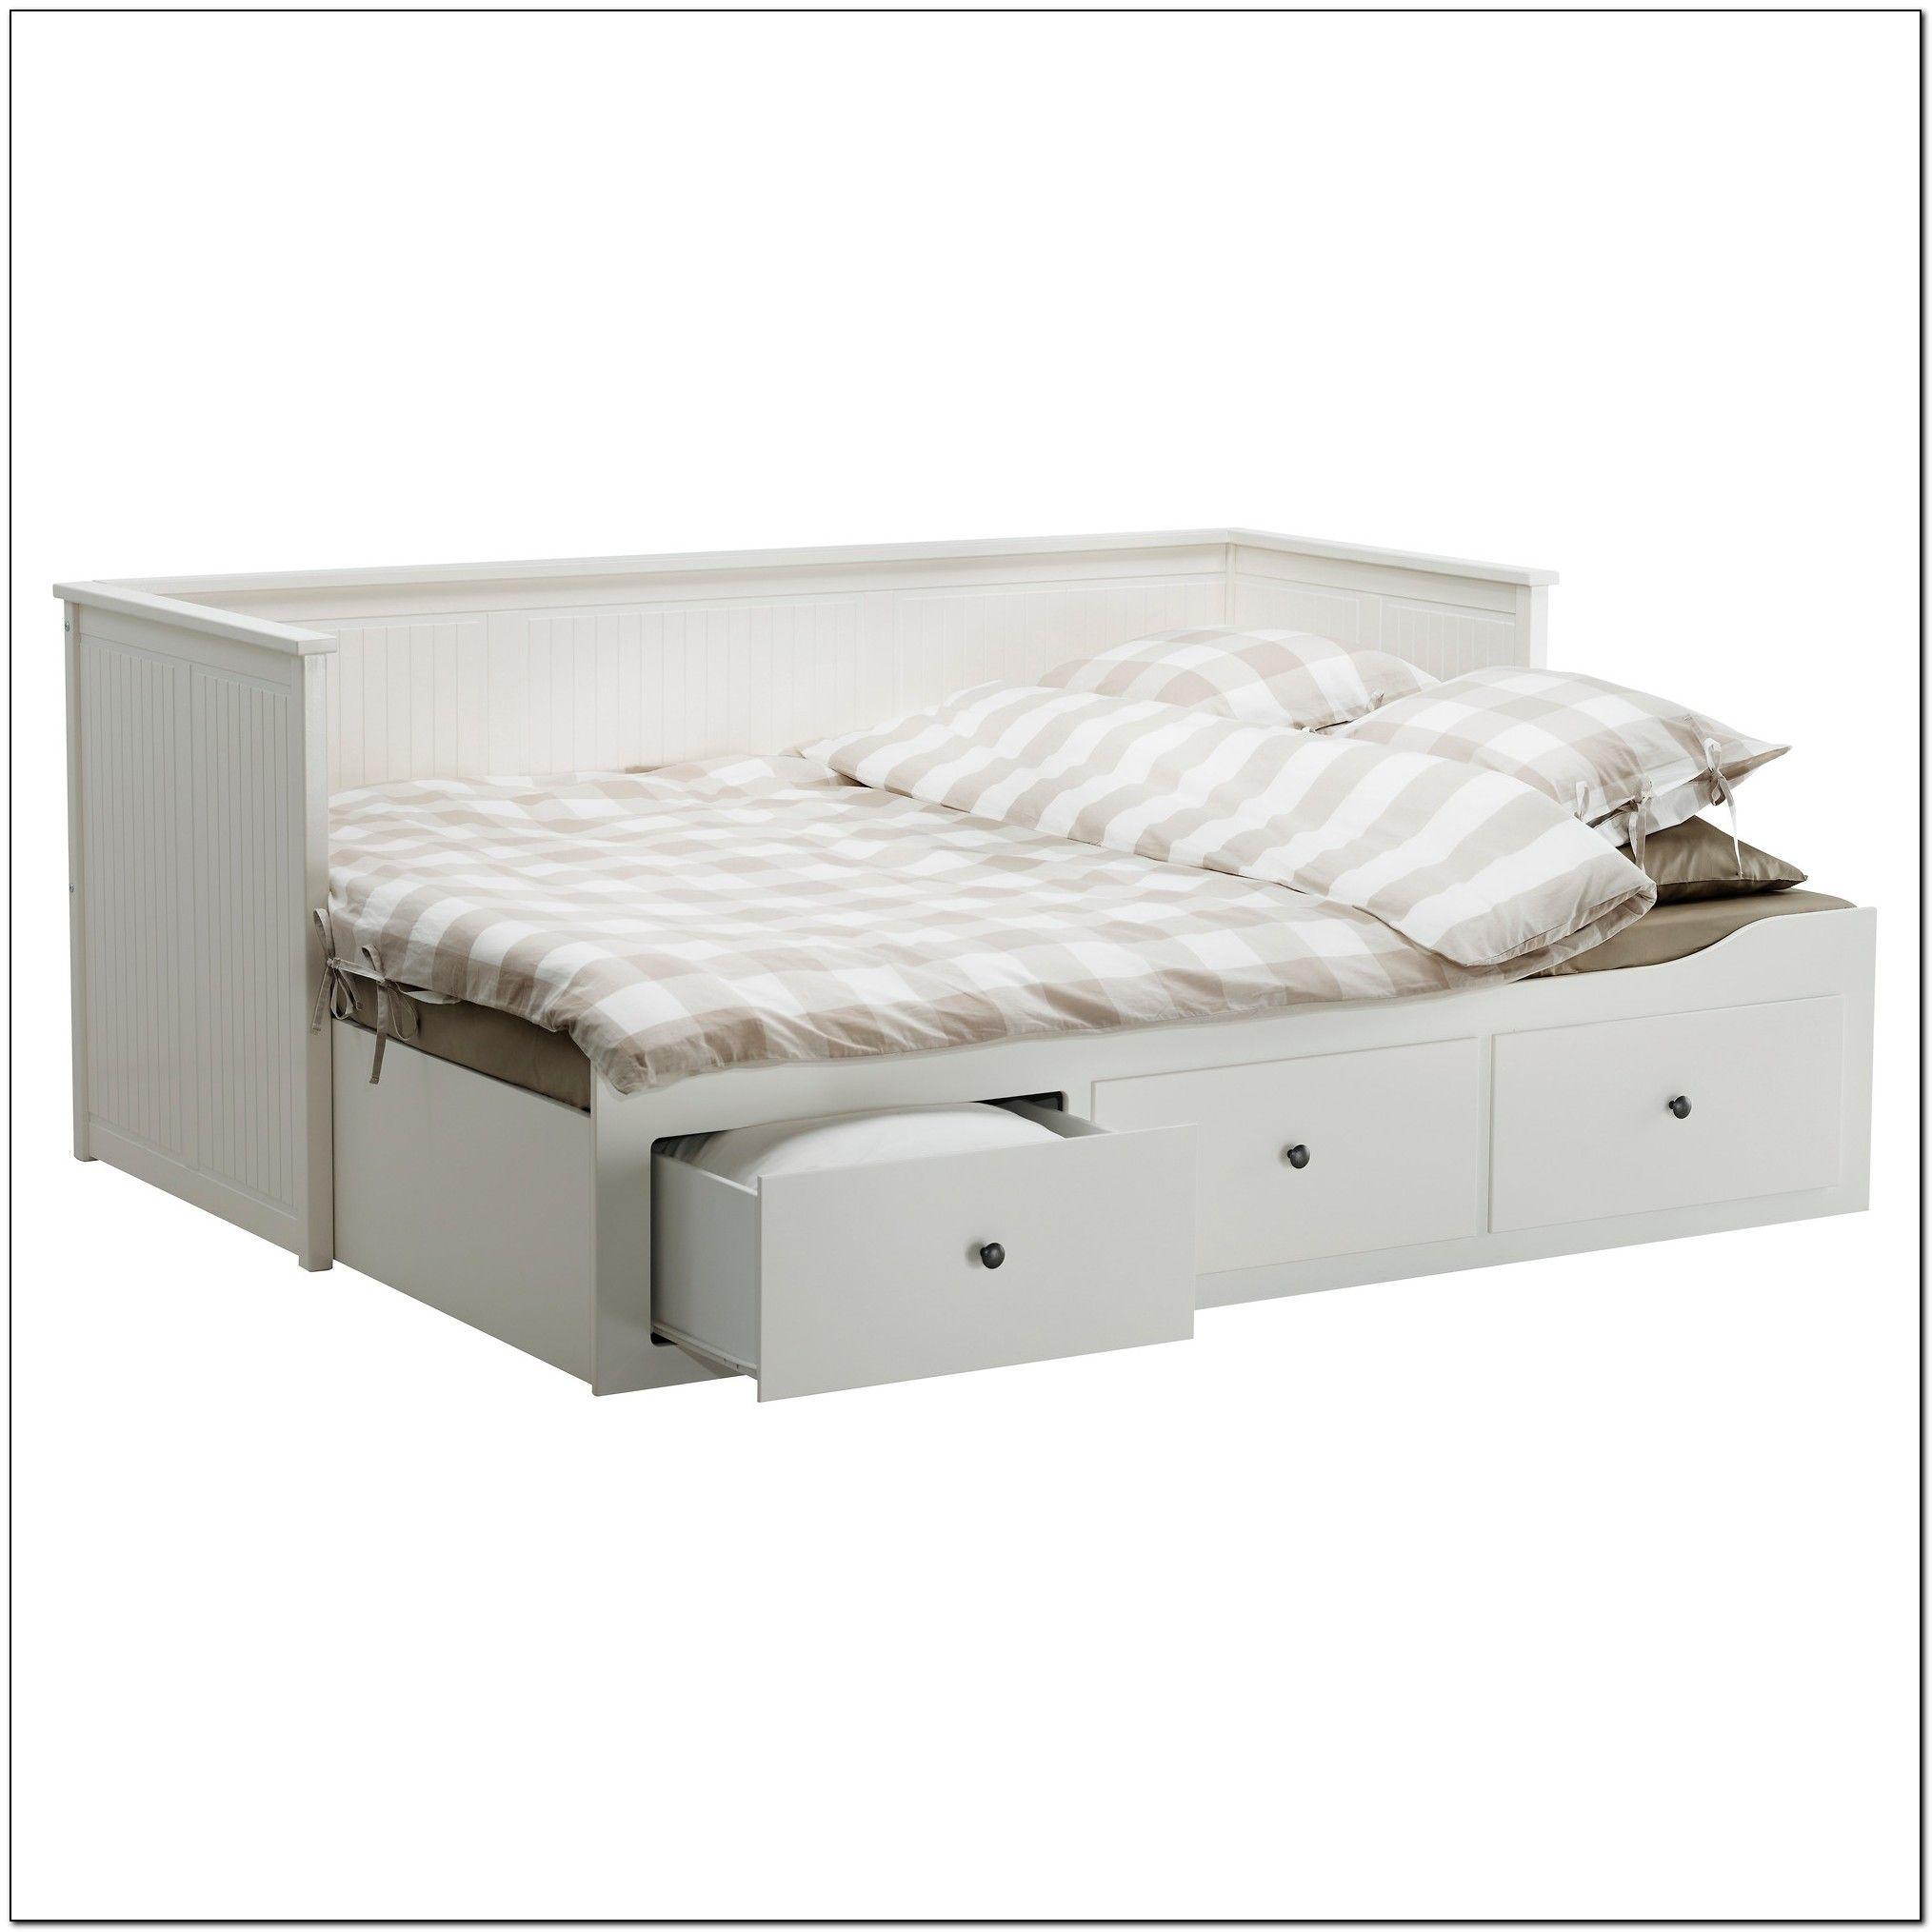 Full Size of Ausziehbares Doppelbett Ikea Ausziehbare Doppelbettcouch Voller Gre Bett Mit Ausziehbarem Bildern Wohnzimmer Ausziehbares Doppelbett